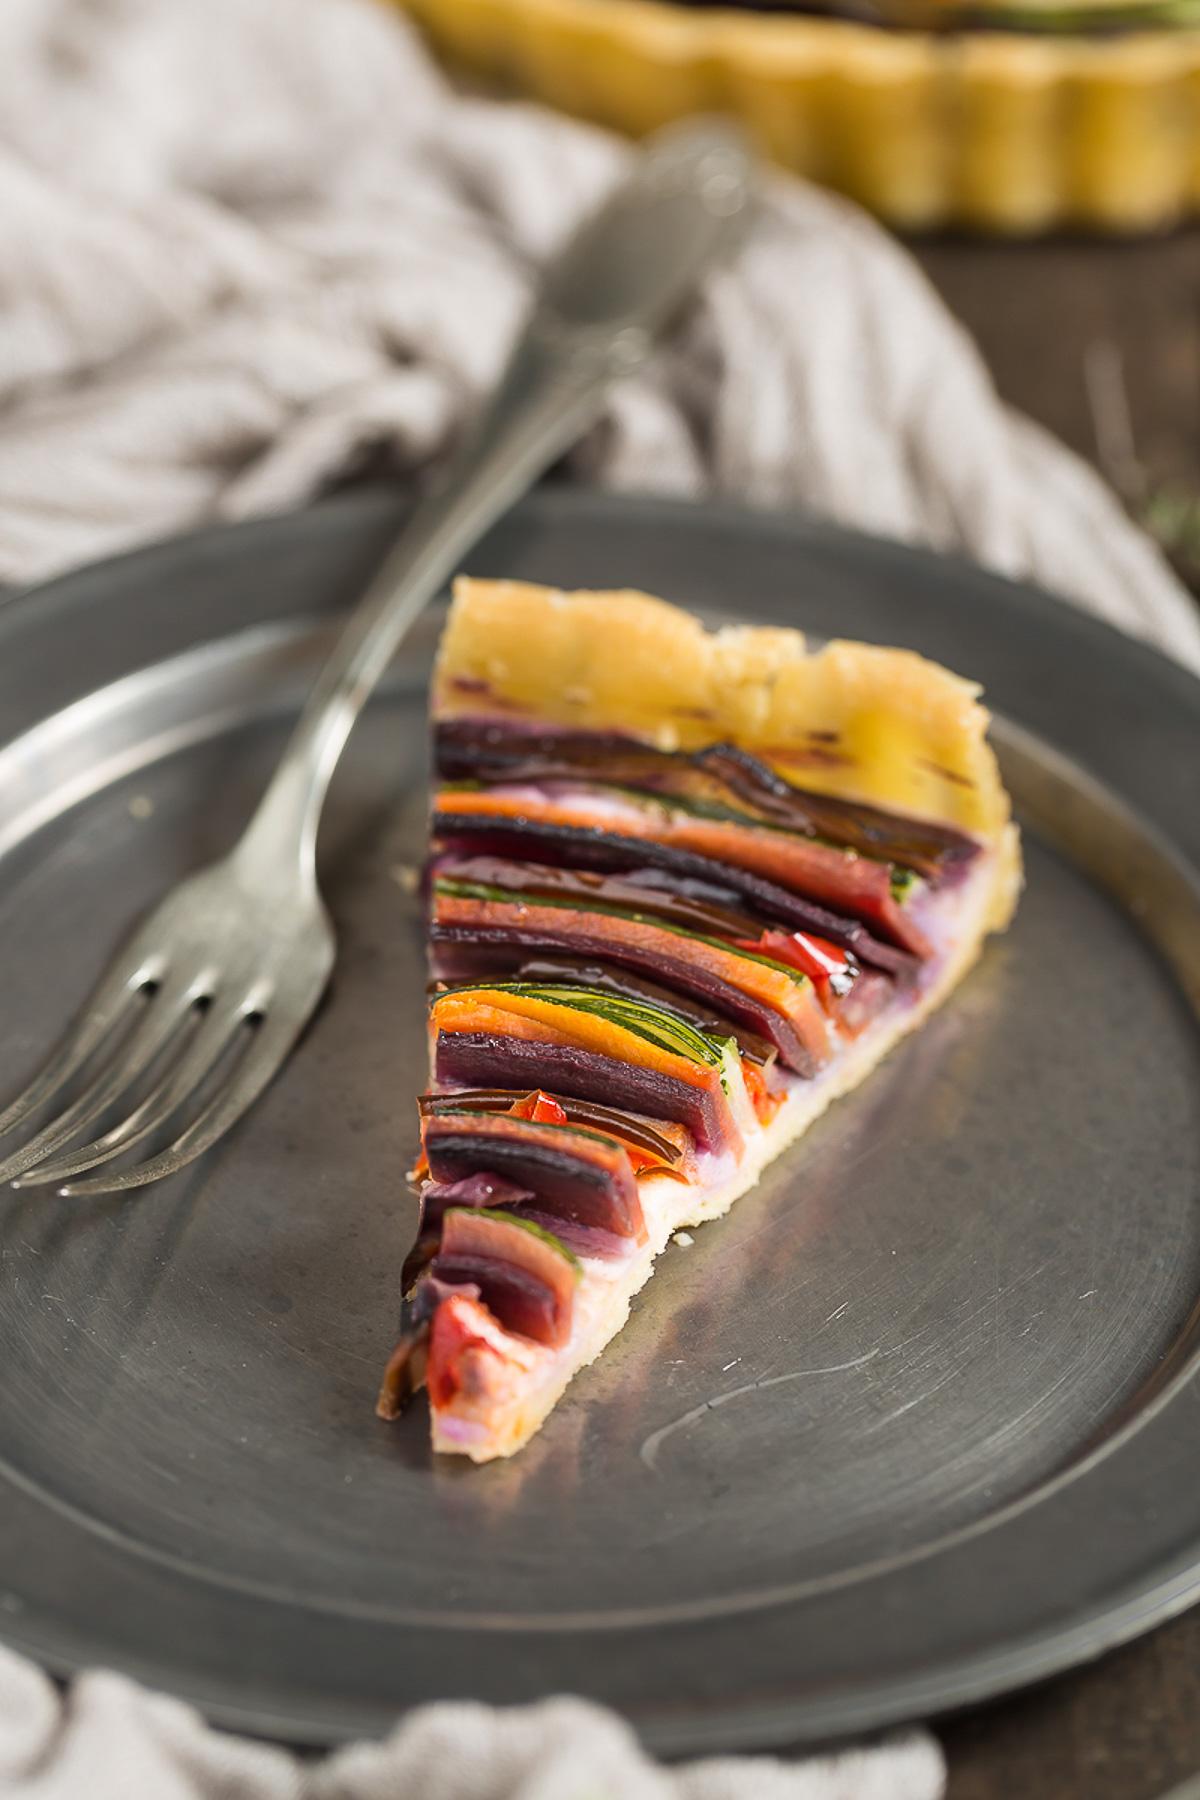 torta salata di verdure a spirale senza glutine senza uova senza burro #vegan | vegan #glutenfree vegetable spiral tart recipe